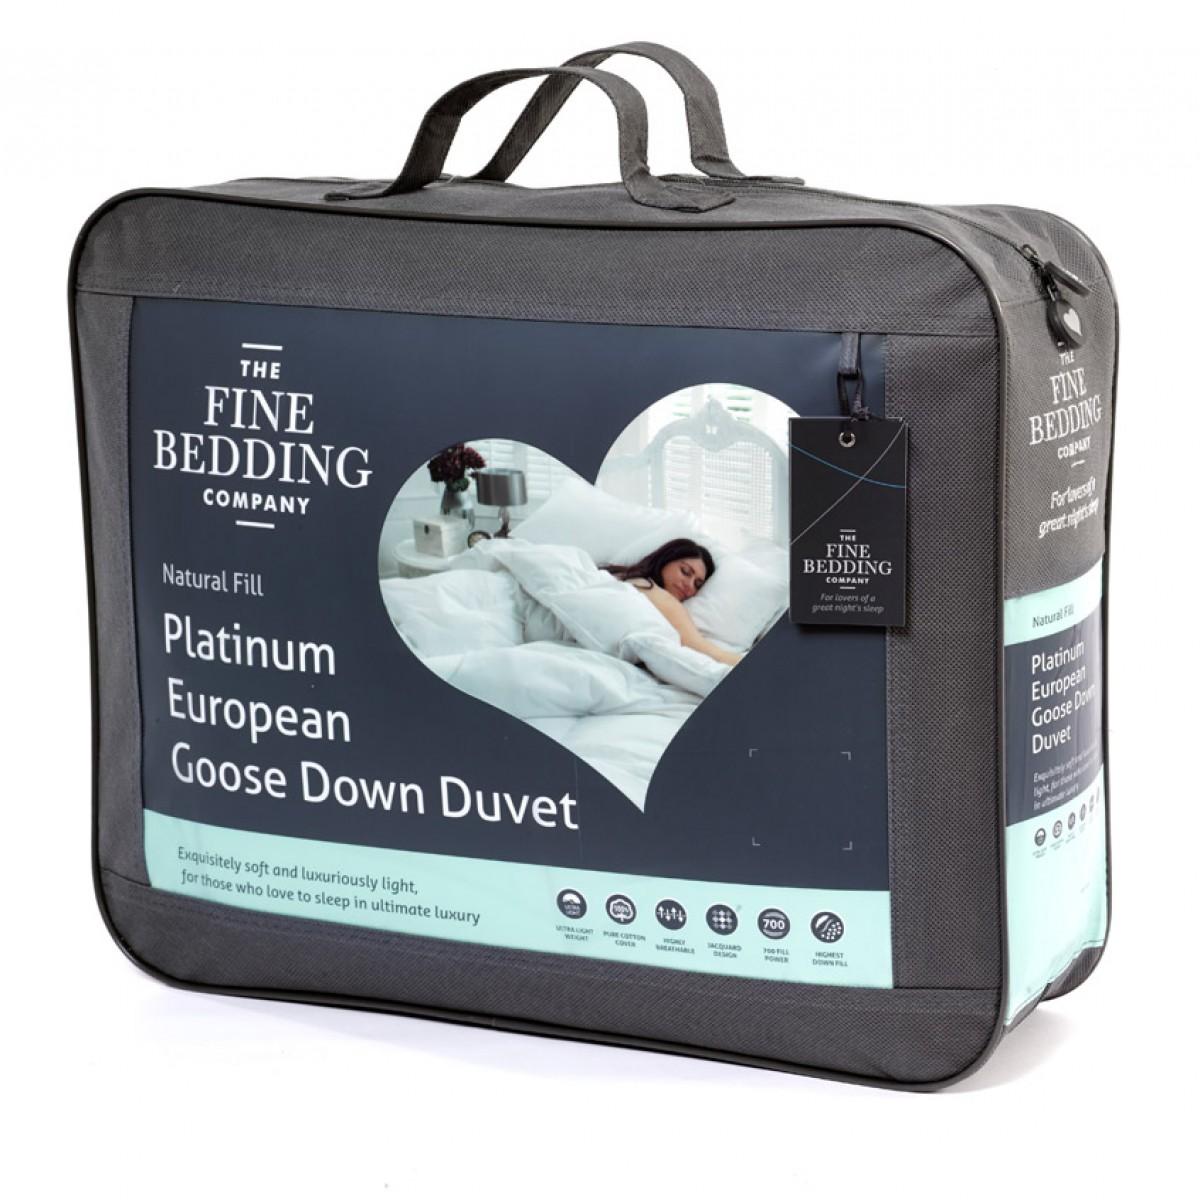 Platinum European Goose Down Duvet By Fine Bedding Company